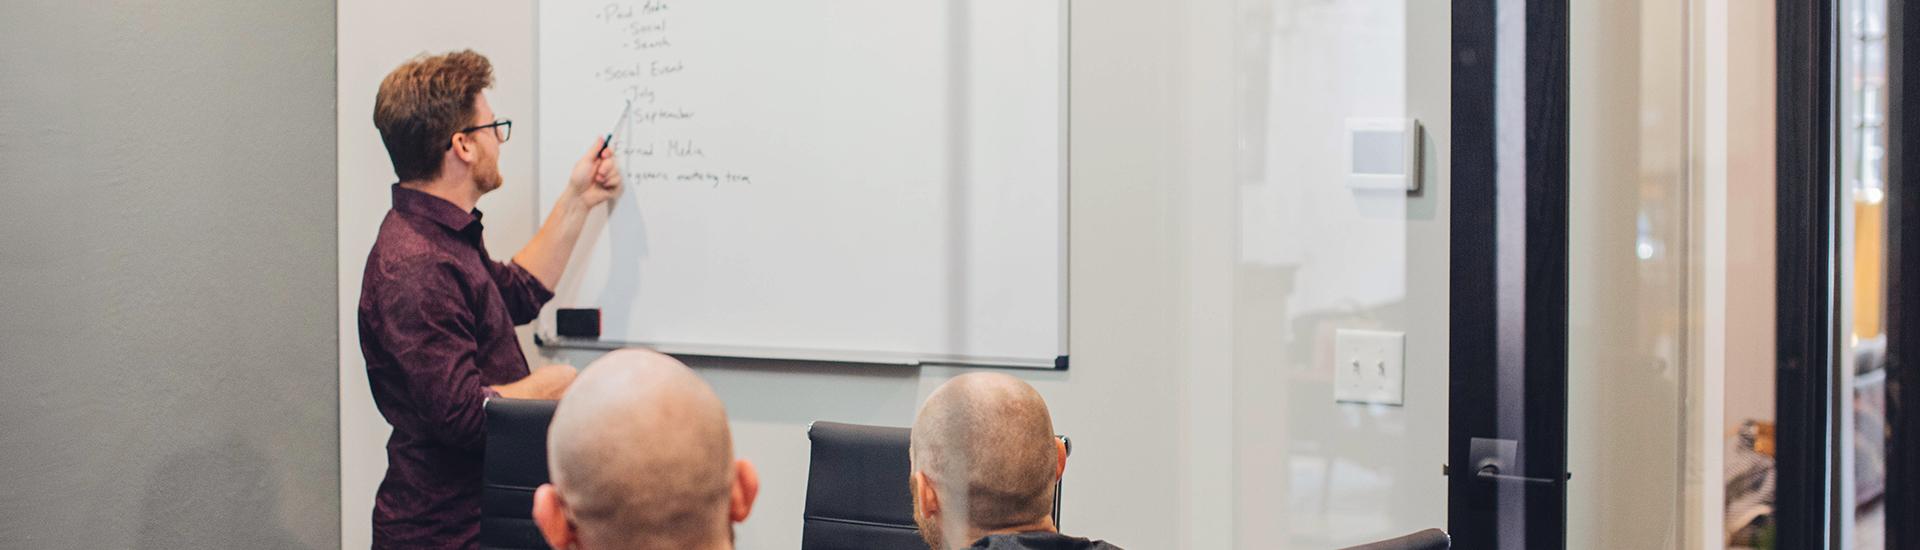 Vye-Blog-Header-How We Develop Effective Marketing & Sales Strategies